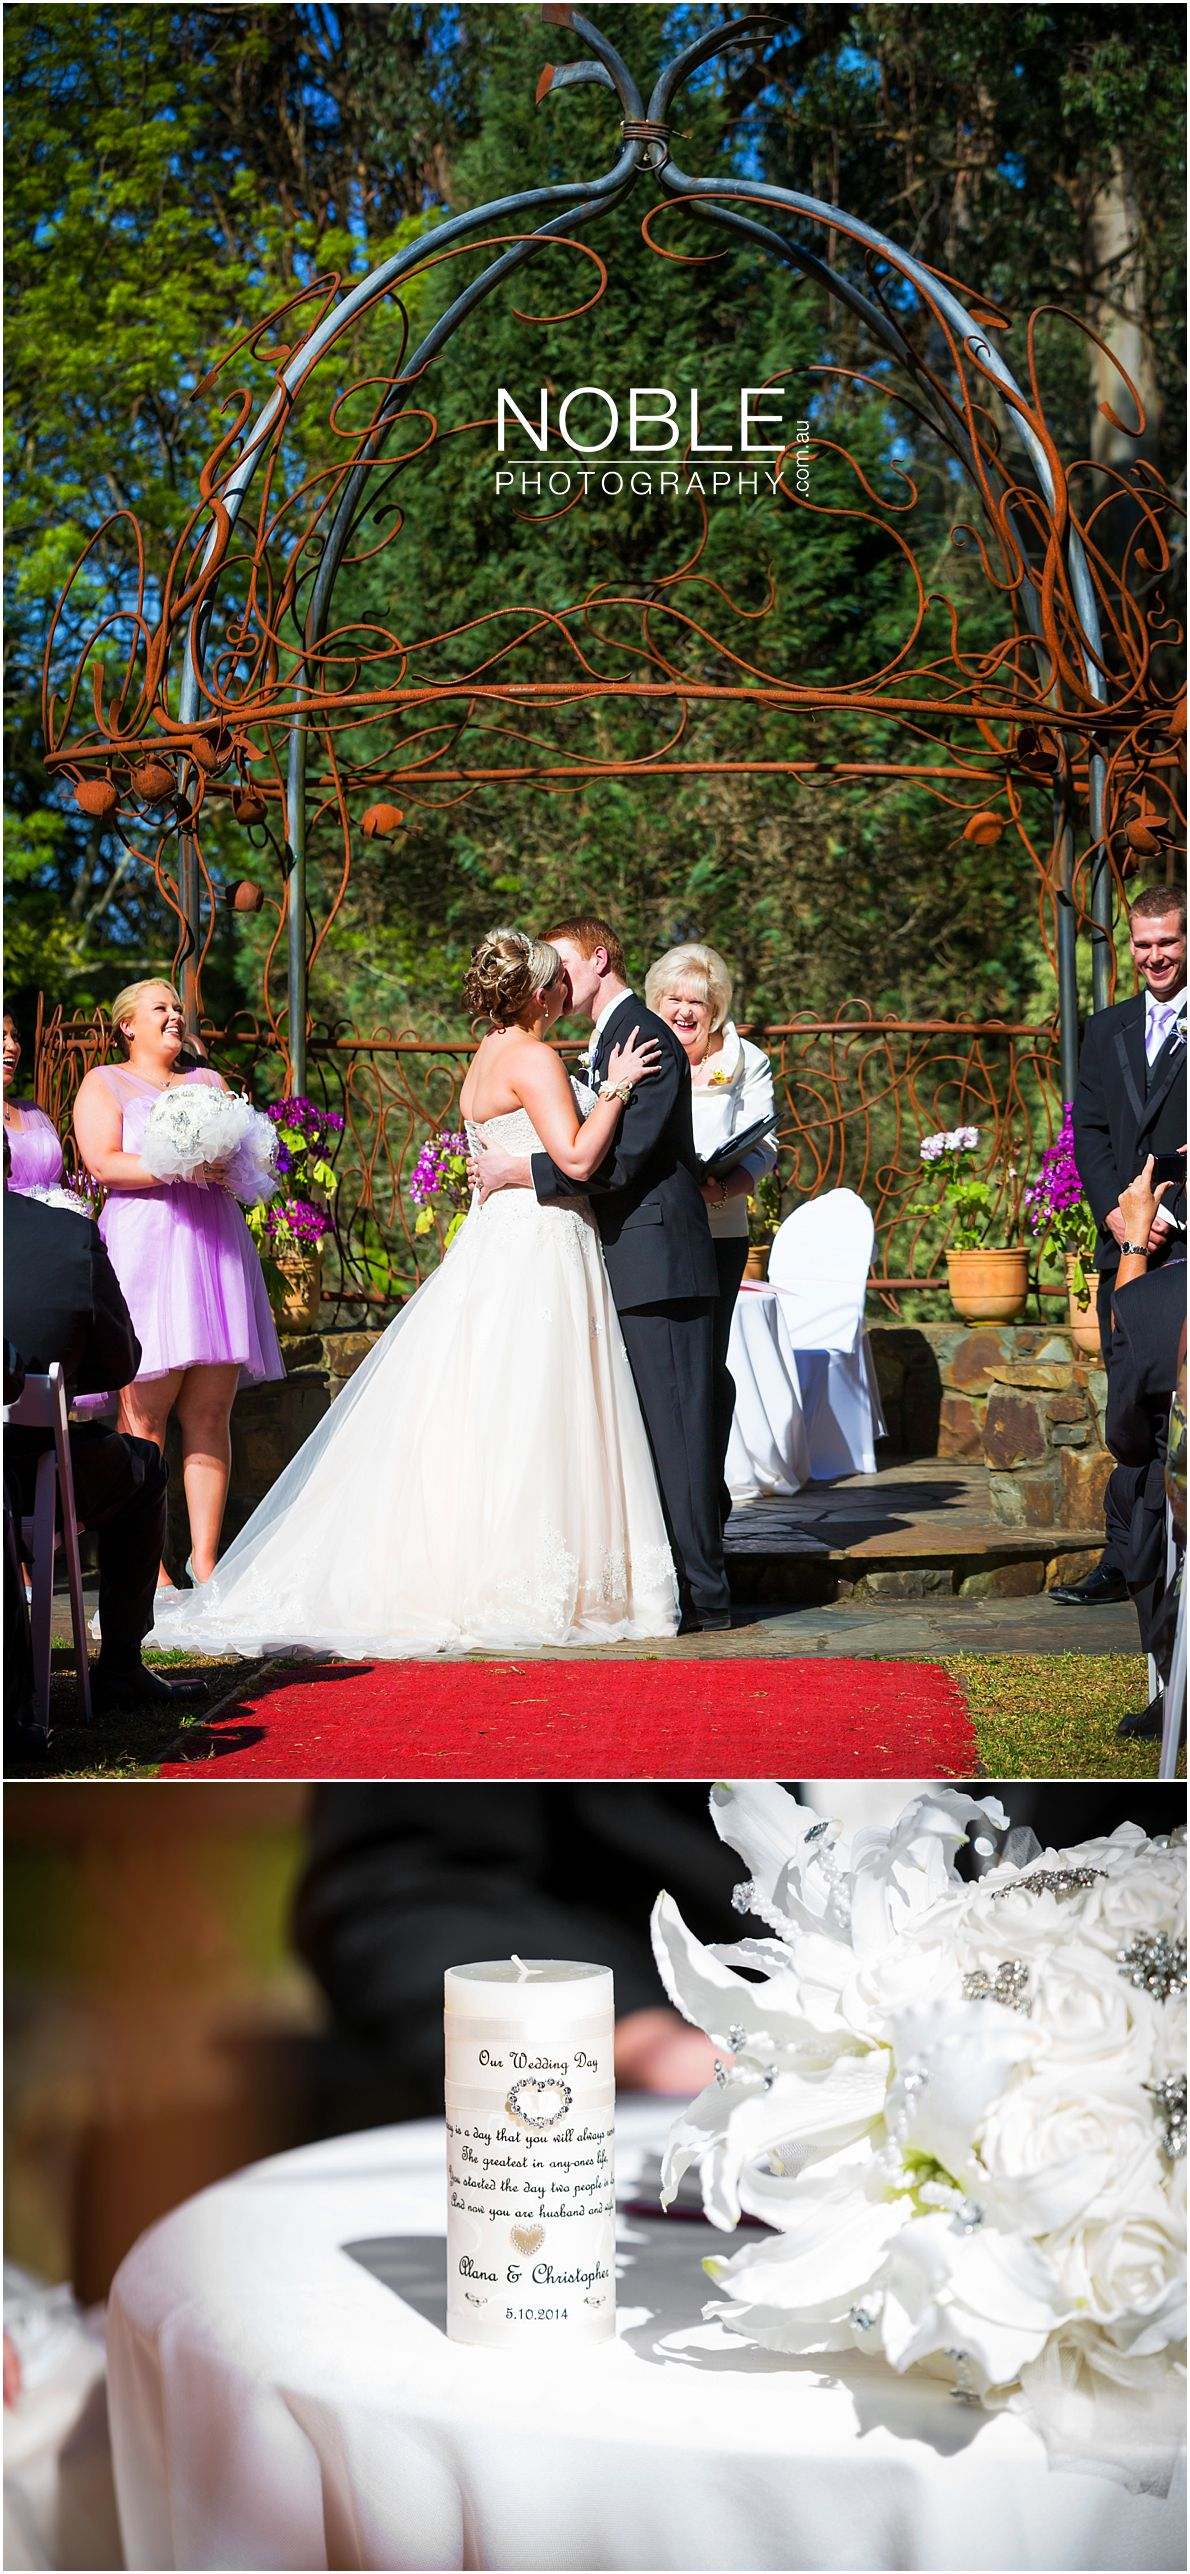 tatra-wedding-ceremony-birdcage.JPG